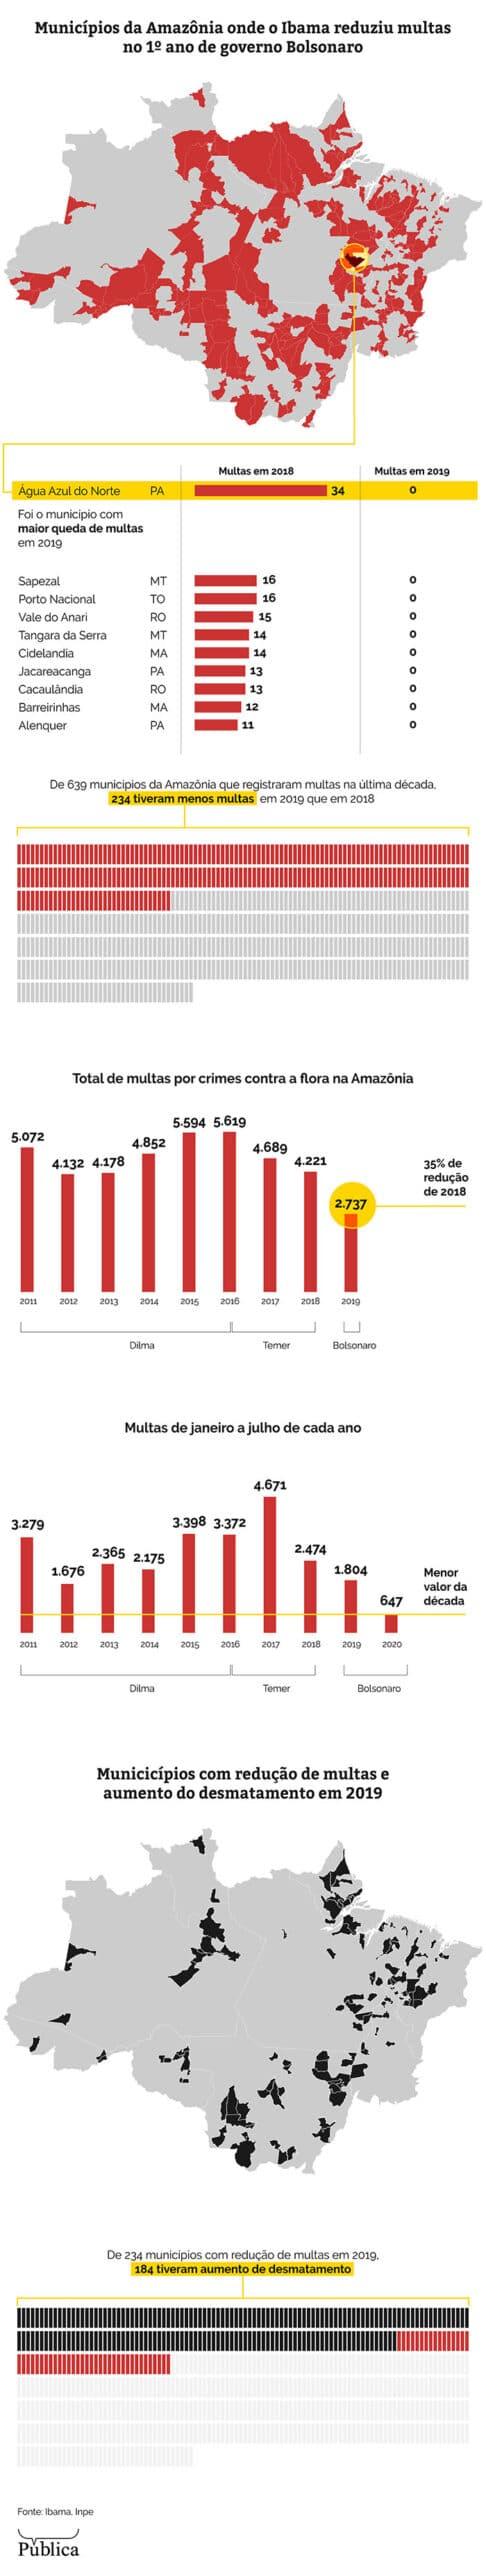 (Infográfico: Larissa Fernandes/Agência Pública)